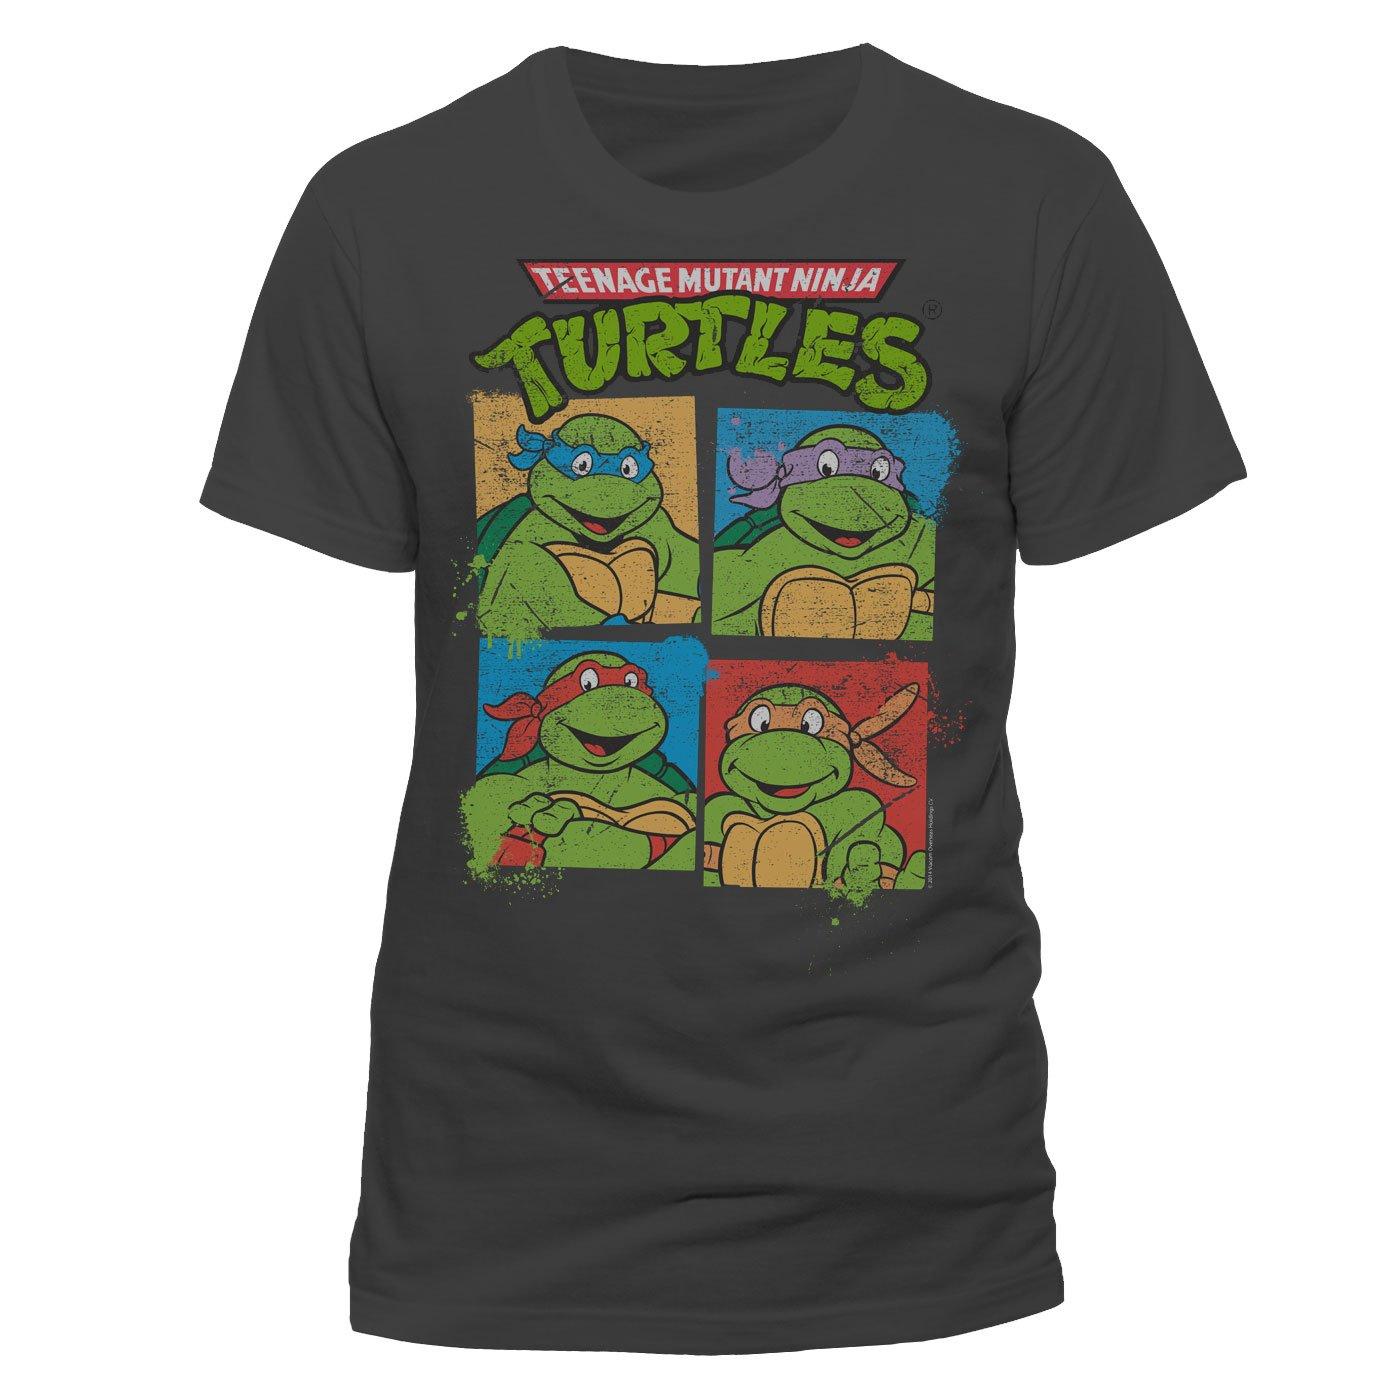 Teenage Mutant Ninja Turtles T-Shirt Group Size XL